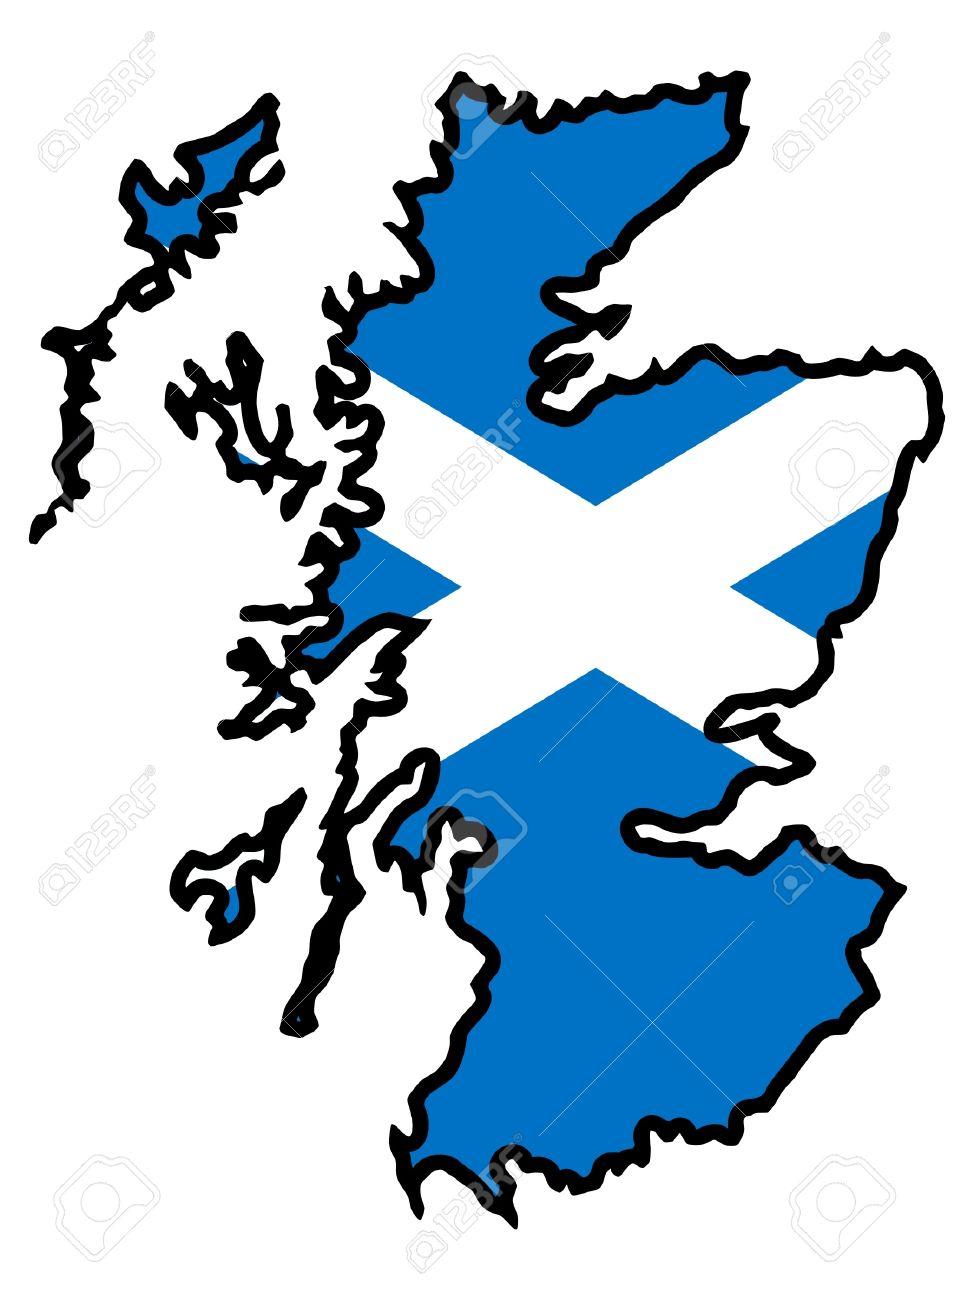 Illustration of flag in map of Scotland on scotland x france, scotland map outline, island of islay scotland map, scotland map google, scotland county map, scotland shortbread recipe, scotland beach, scotland name map, scotland community, scotland on map, scotland map large, scotland lion, scotland travel map, silhouette scotland map, scotland football map, scotland tattoo, scotland road map,